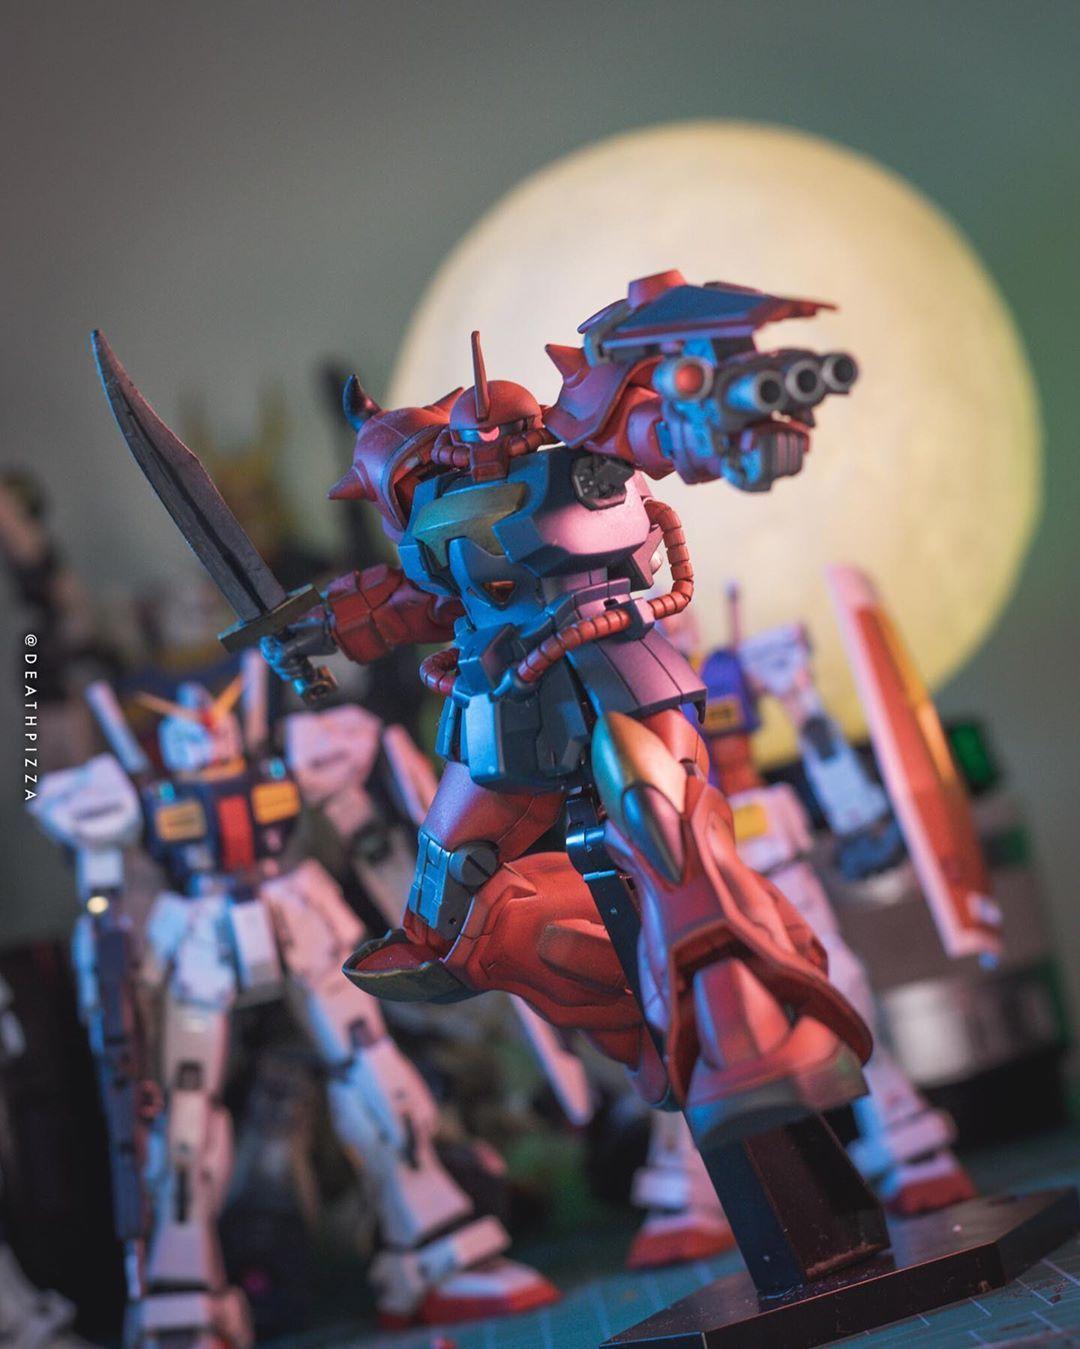 Custom Red Gauf. #GUNDAMSTAGRAM #gundam #bandai #gunpla #mobilesuit #mecha #buildfighters #anime #toys #toy #otaku #plamo #plasticmodel #hobby #gundambuilder #gunplabuilder #nerd #geek #toycrewbuddies #toypops3 #canonphotography #moongundam